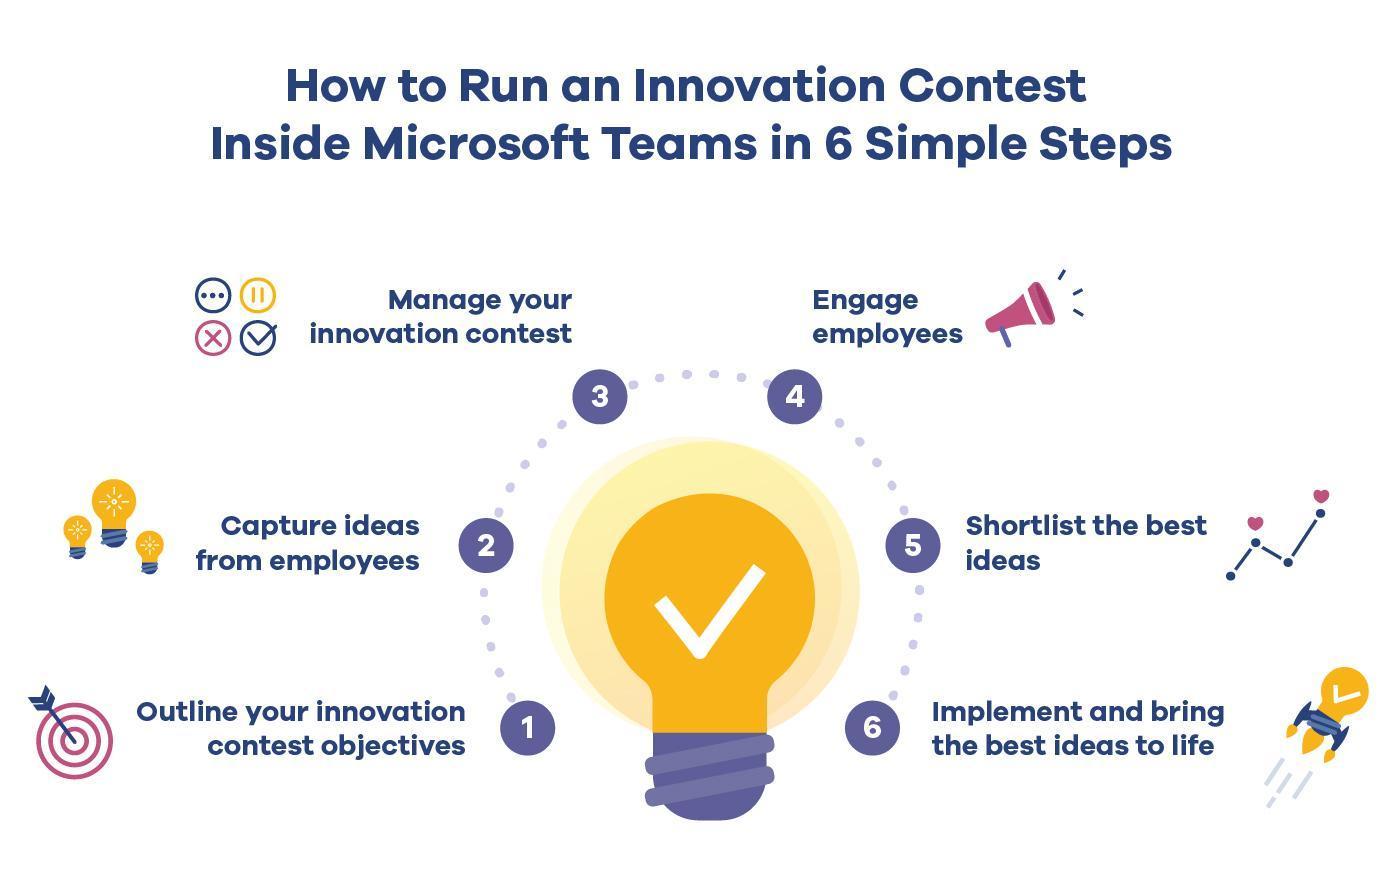 Innovation contest inside Microsoft Teams